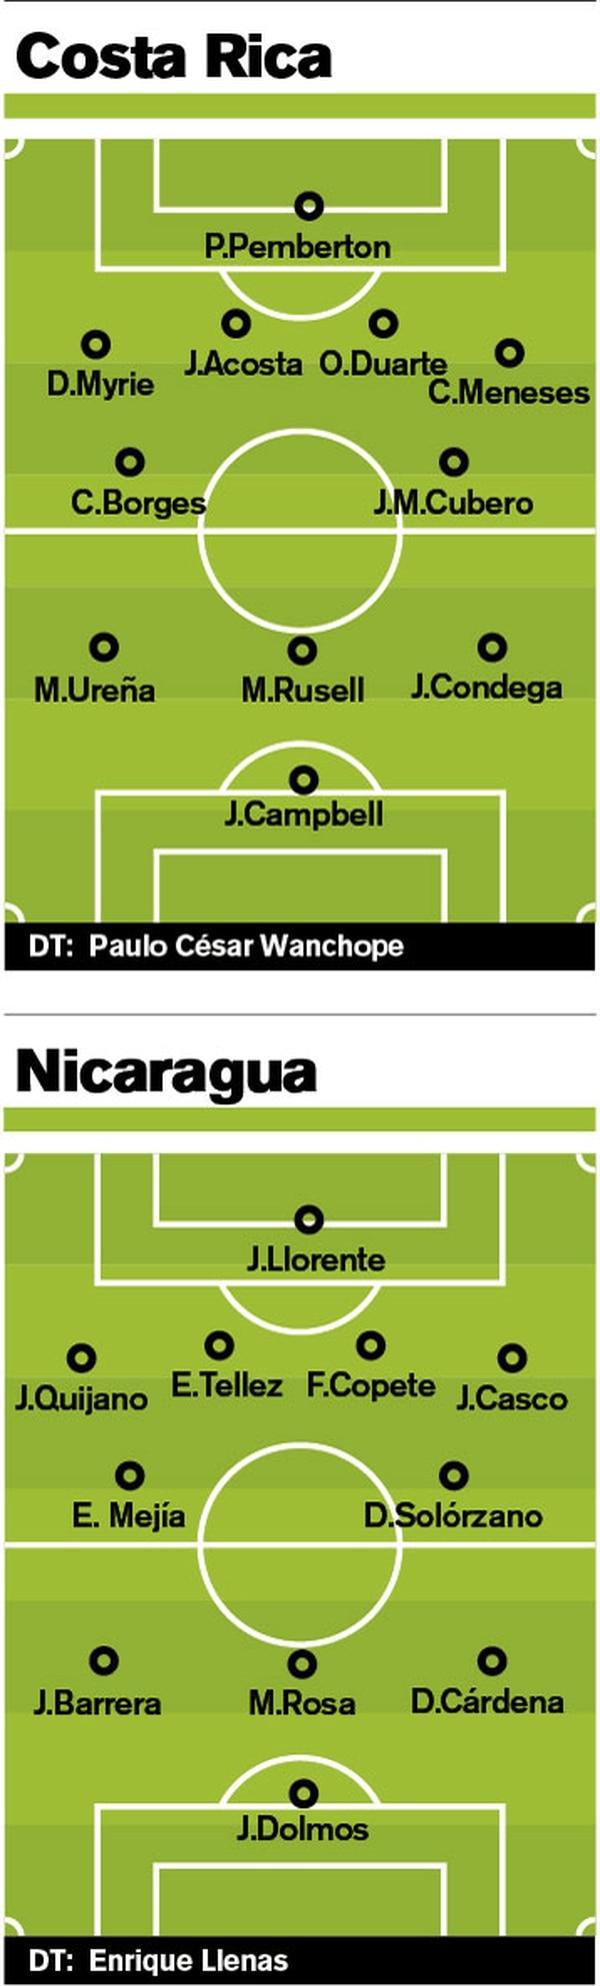 Costa Rica Vs Nicaragua